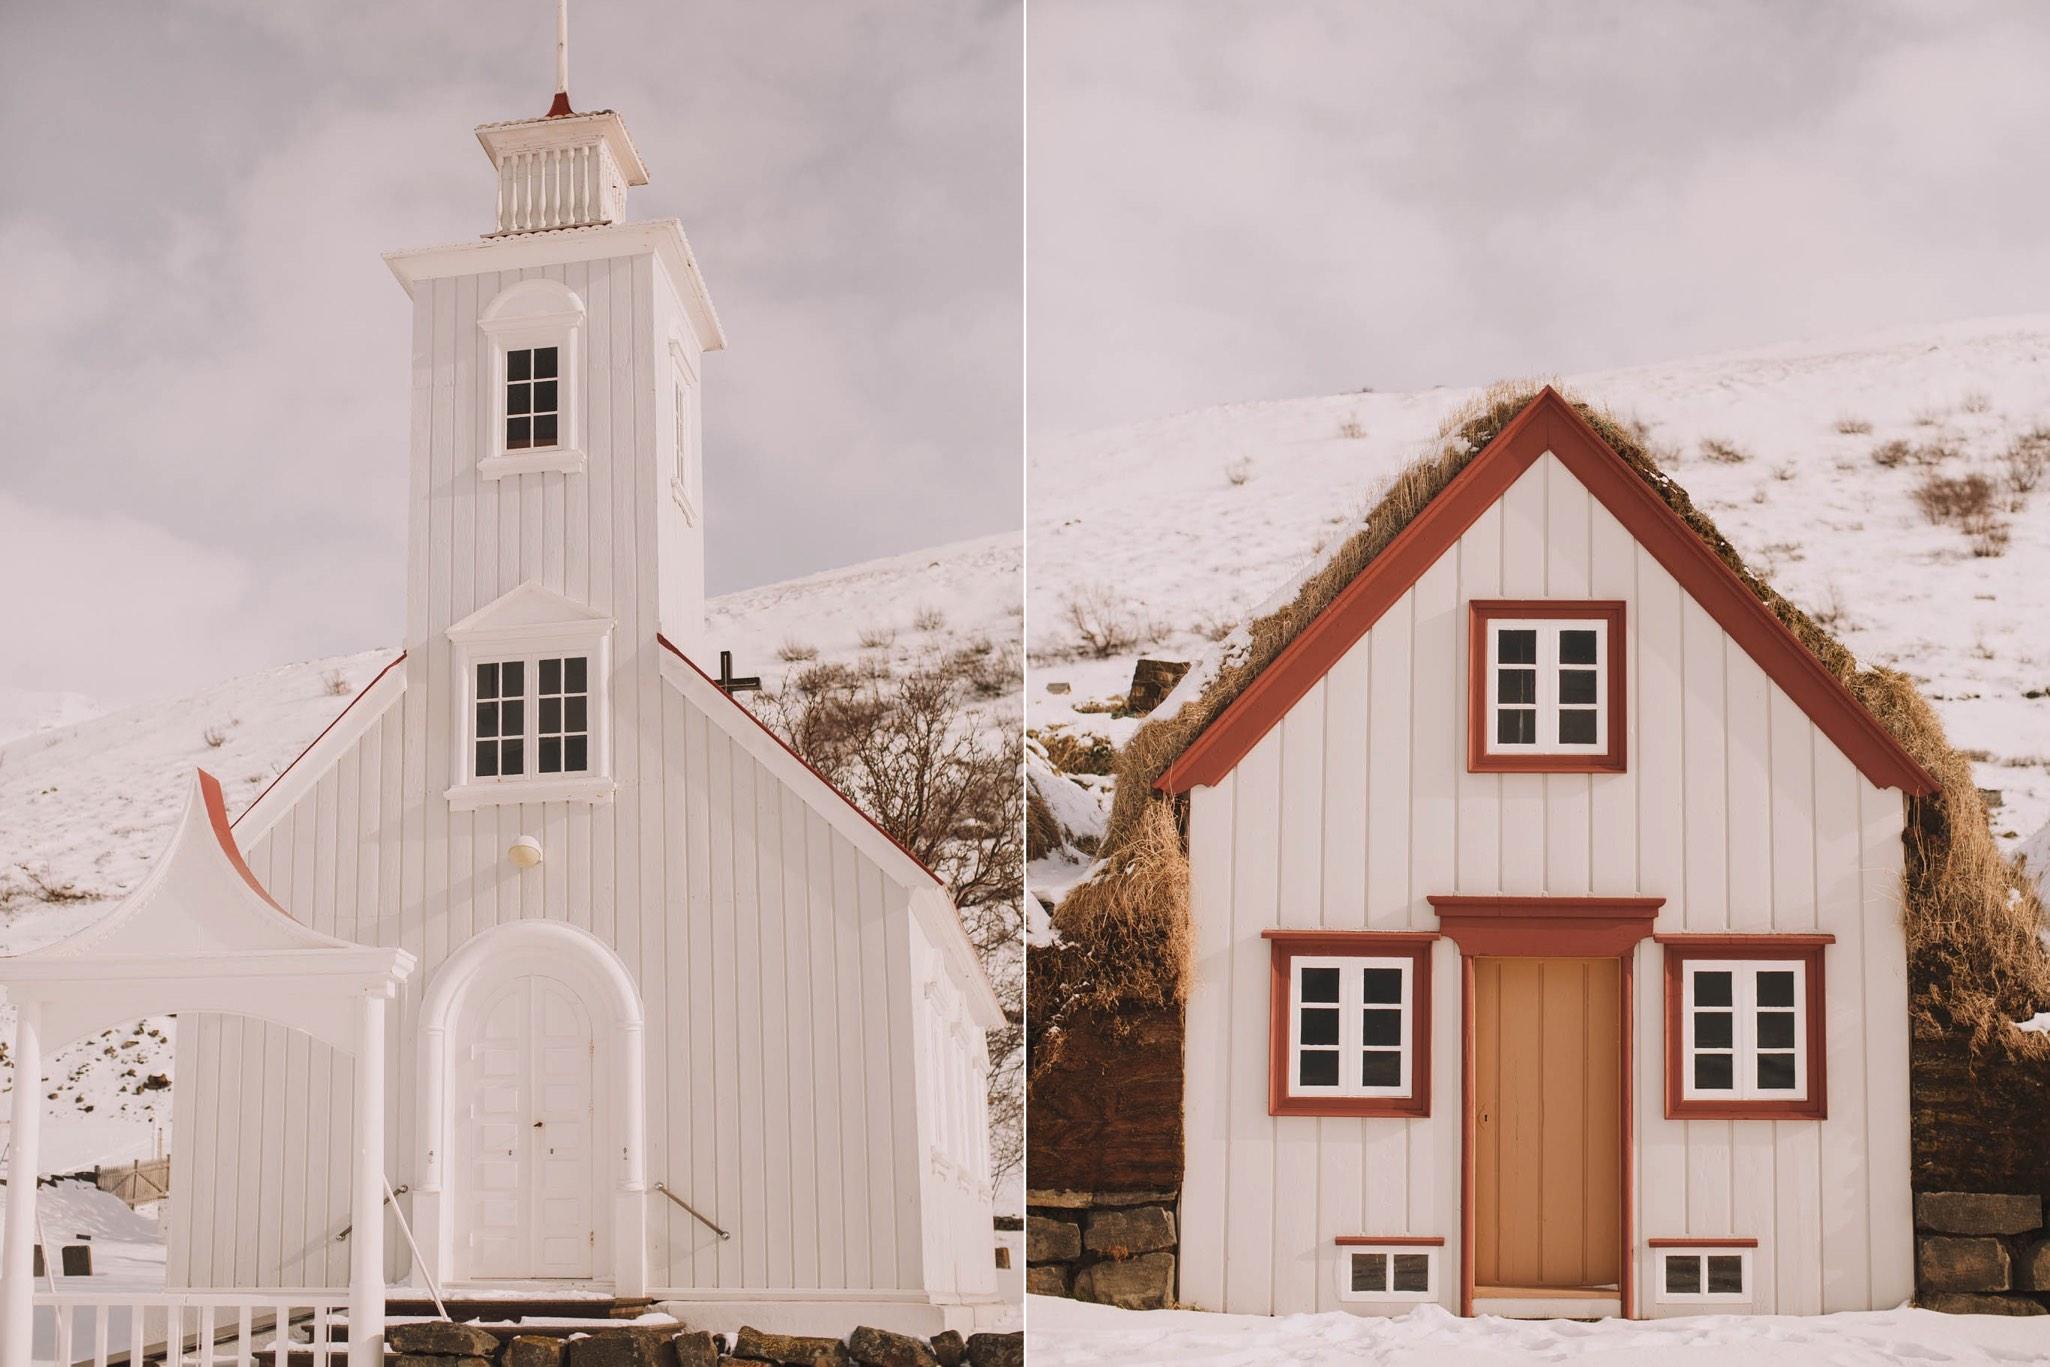 Road-trip-Islande-Iceland-Voyage-Travel-Portrait-Jérémy-Boyer-church-eglise-2.jpg